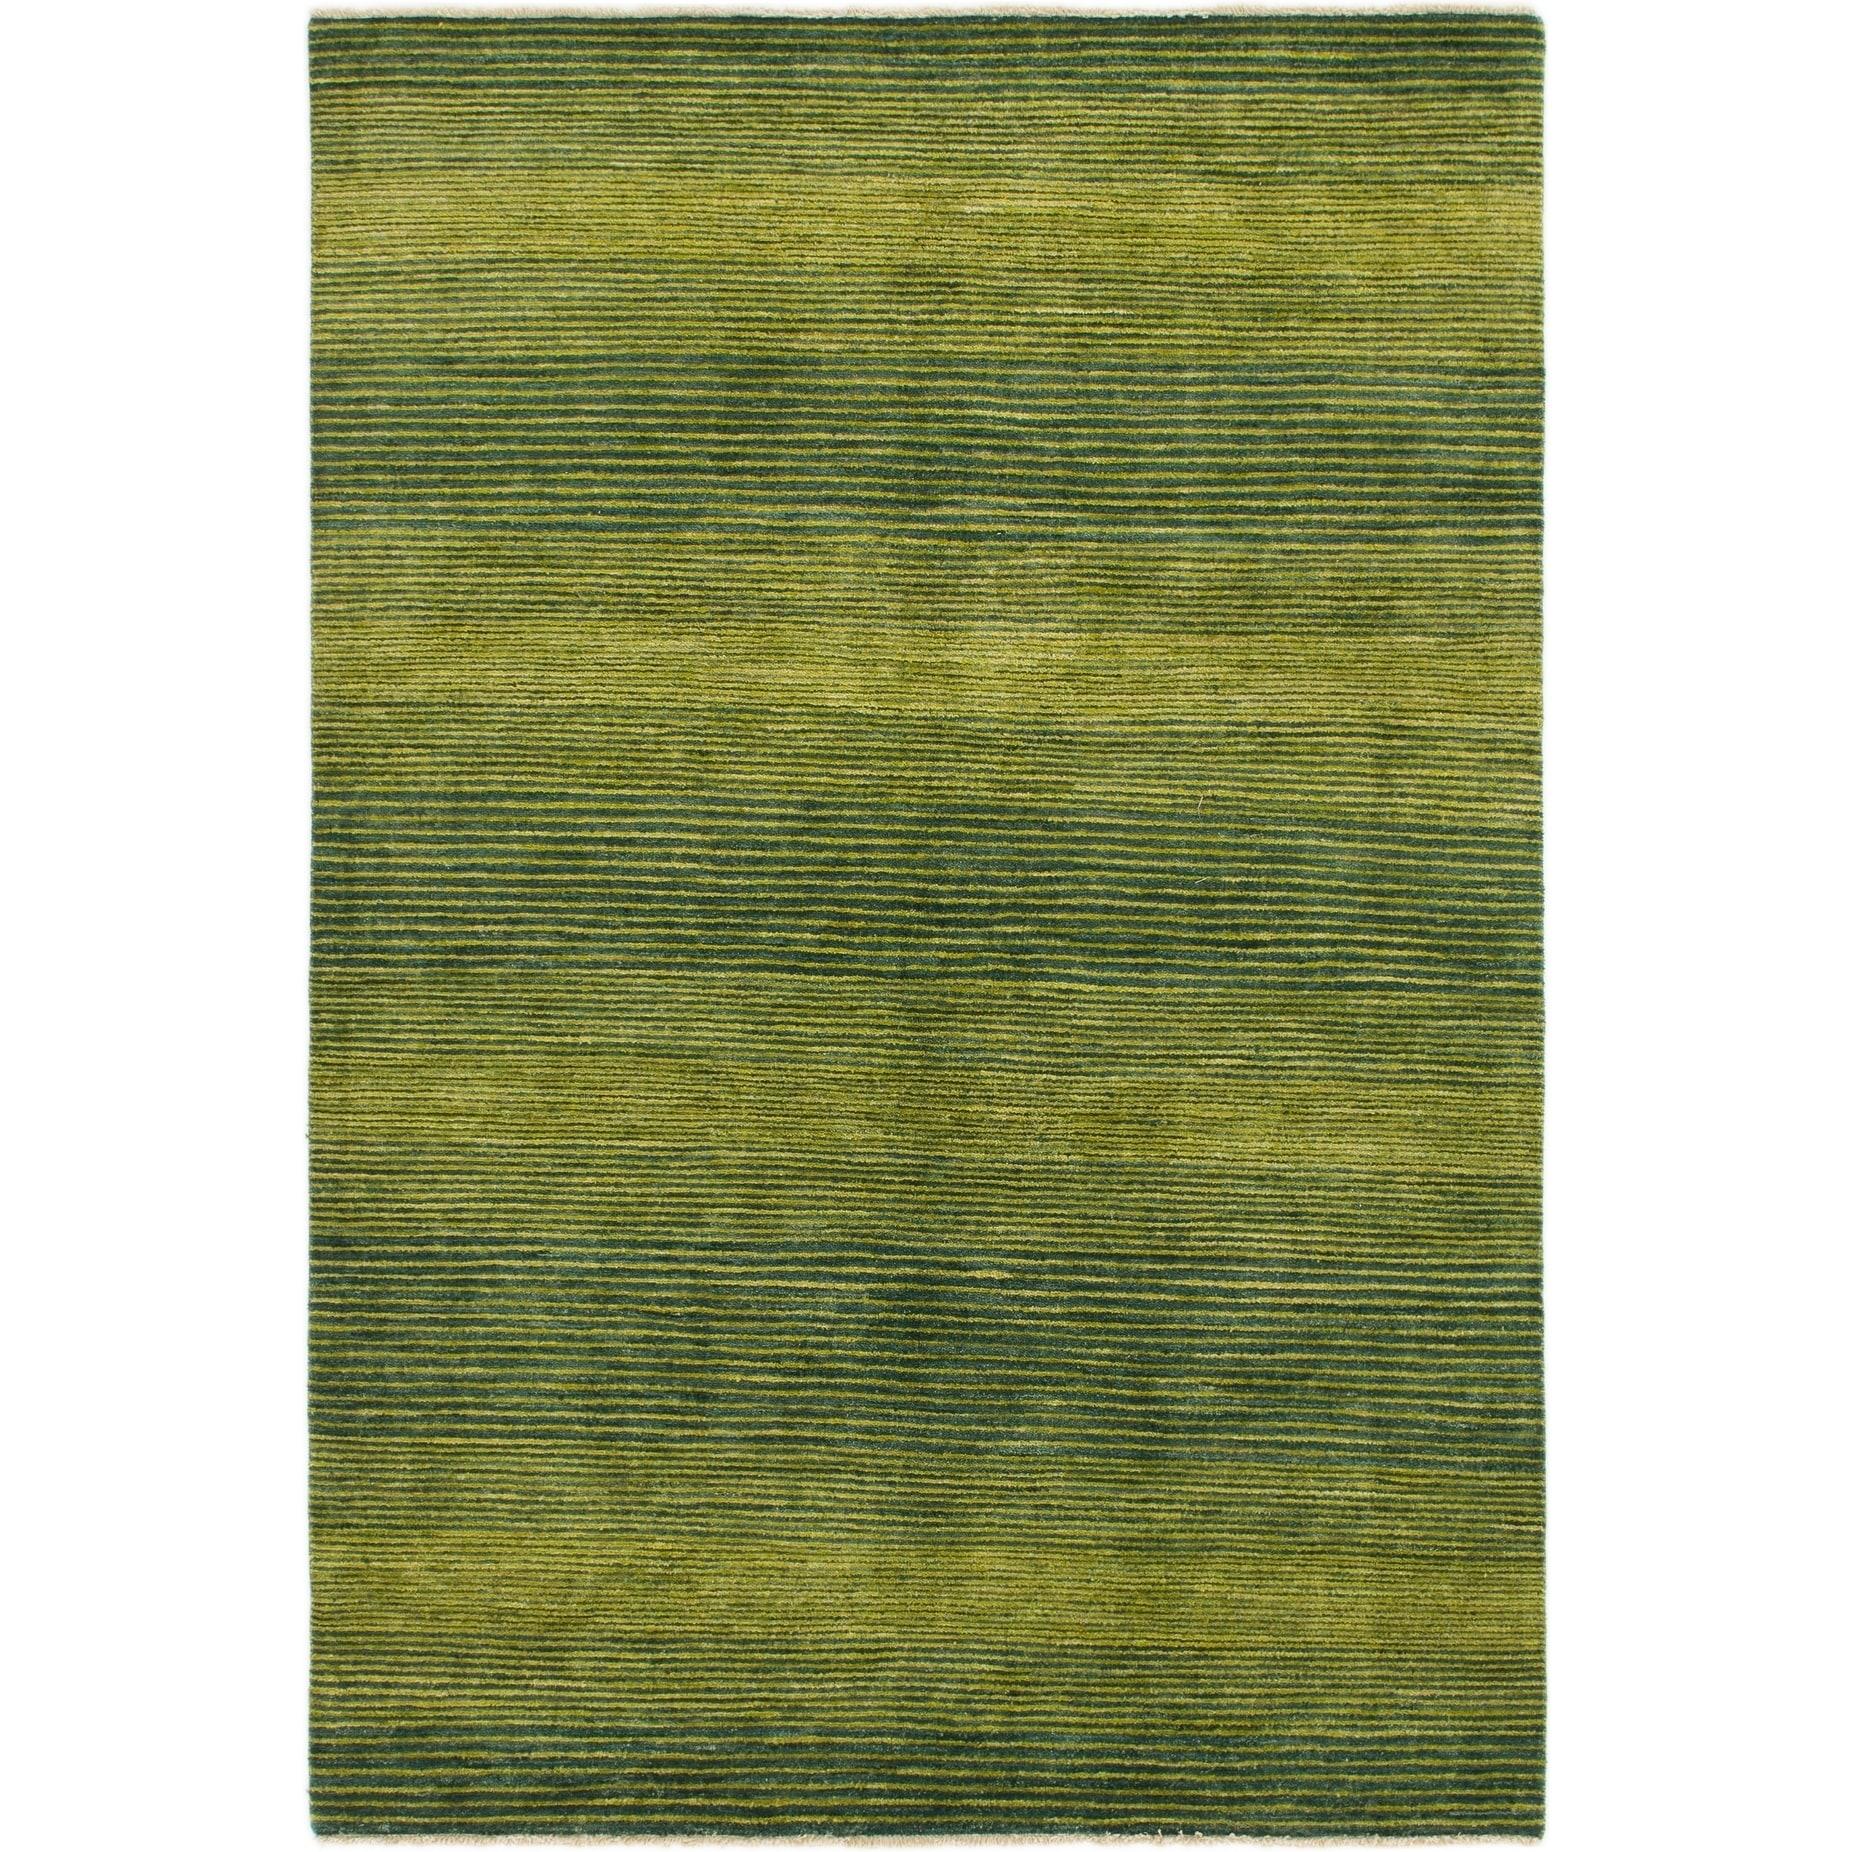 Hand Knotted Kashkuli Gabbeh Wool Area Rug - 5 6 x 8 2 (Hunter green - 5 6 x 8 2)